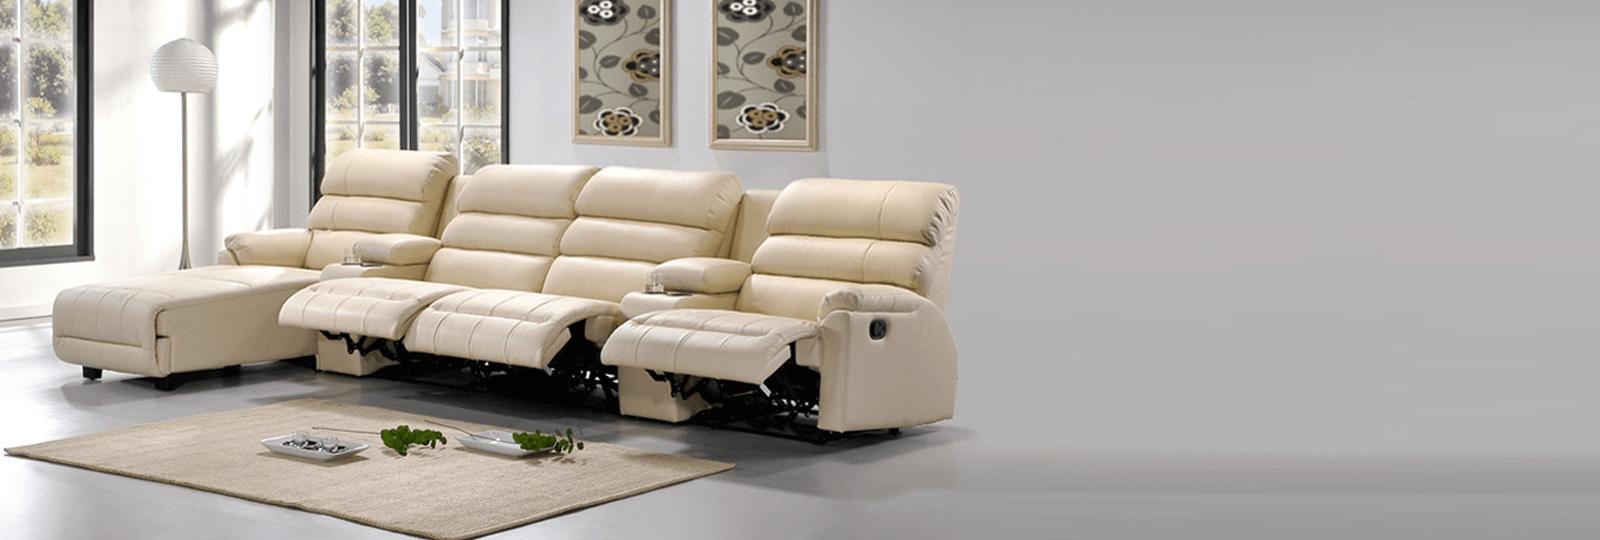 Univonna Top Furniture Manufacturer In Singapore